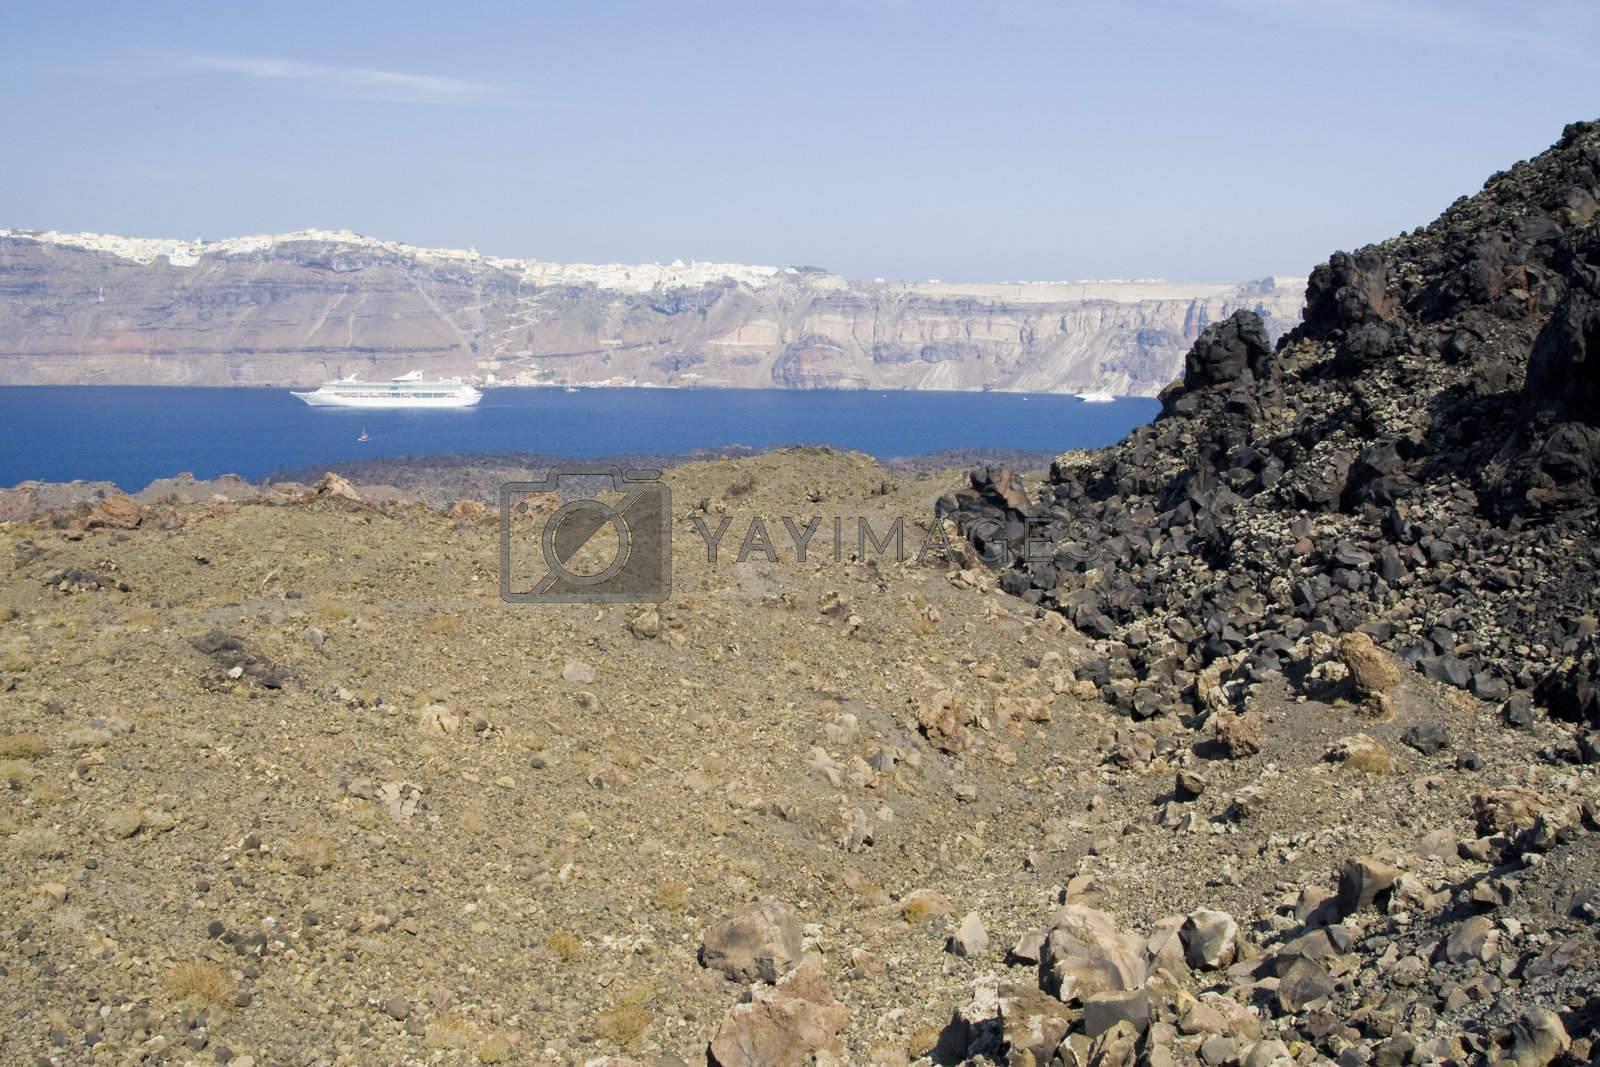 Santorini Island - summer holiday destination in Greece